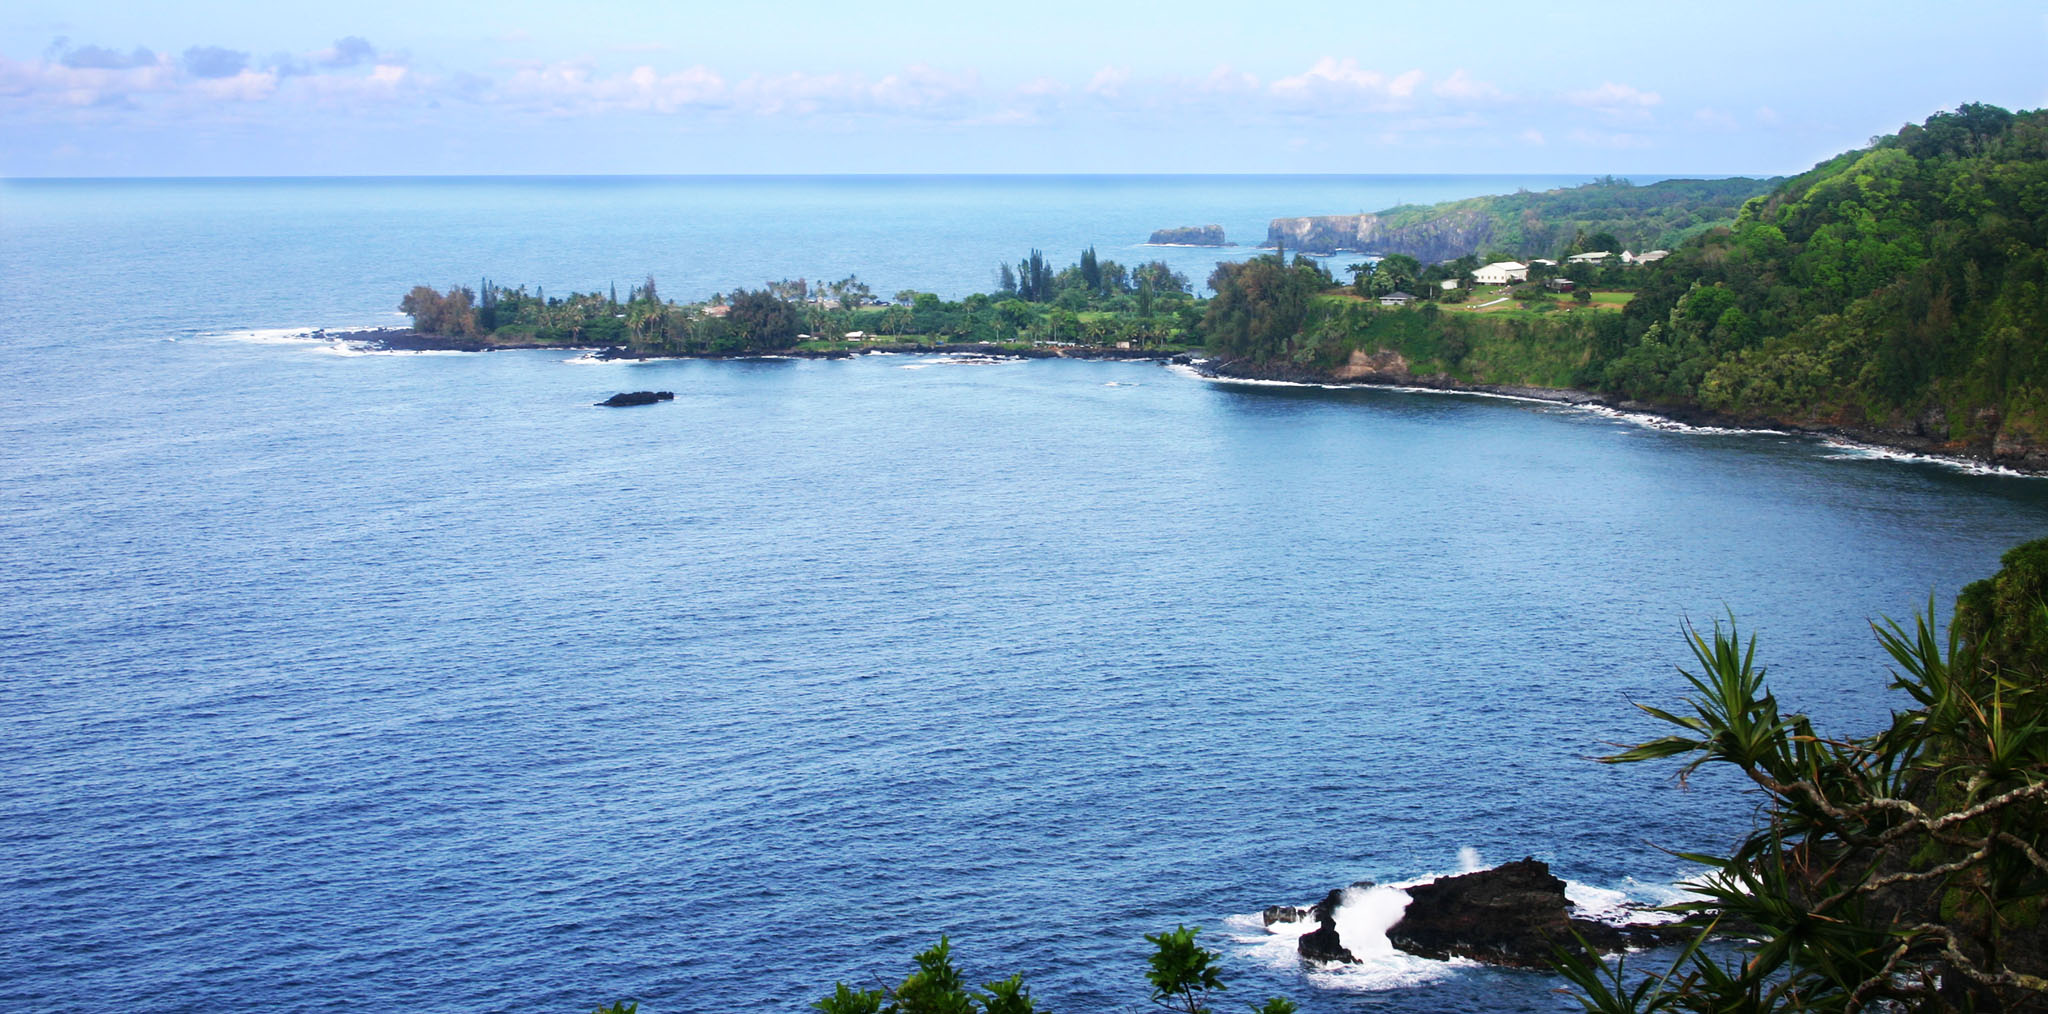 Keanae, Maui